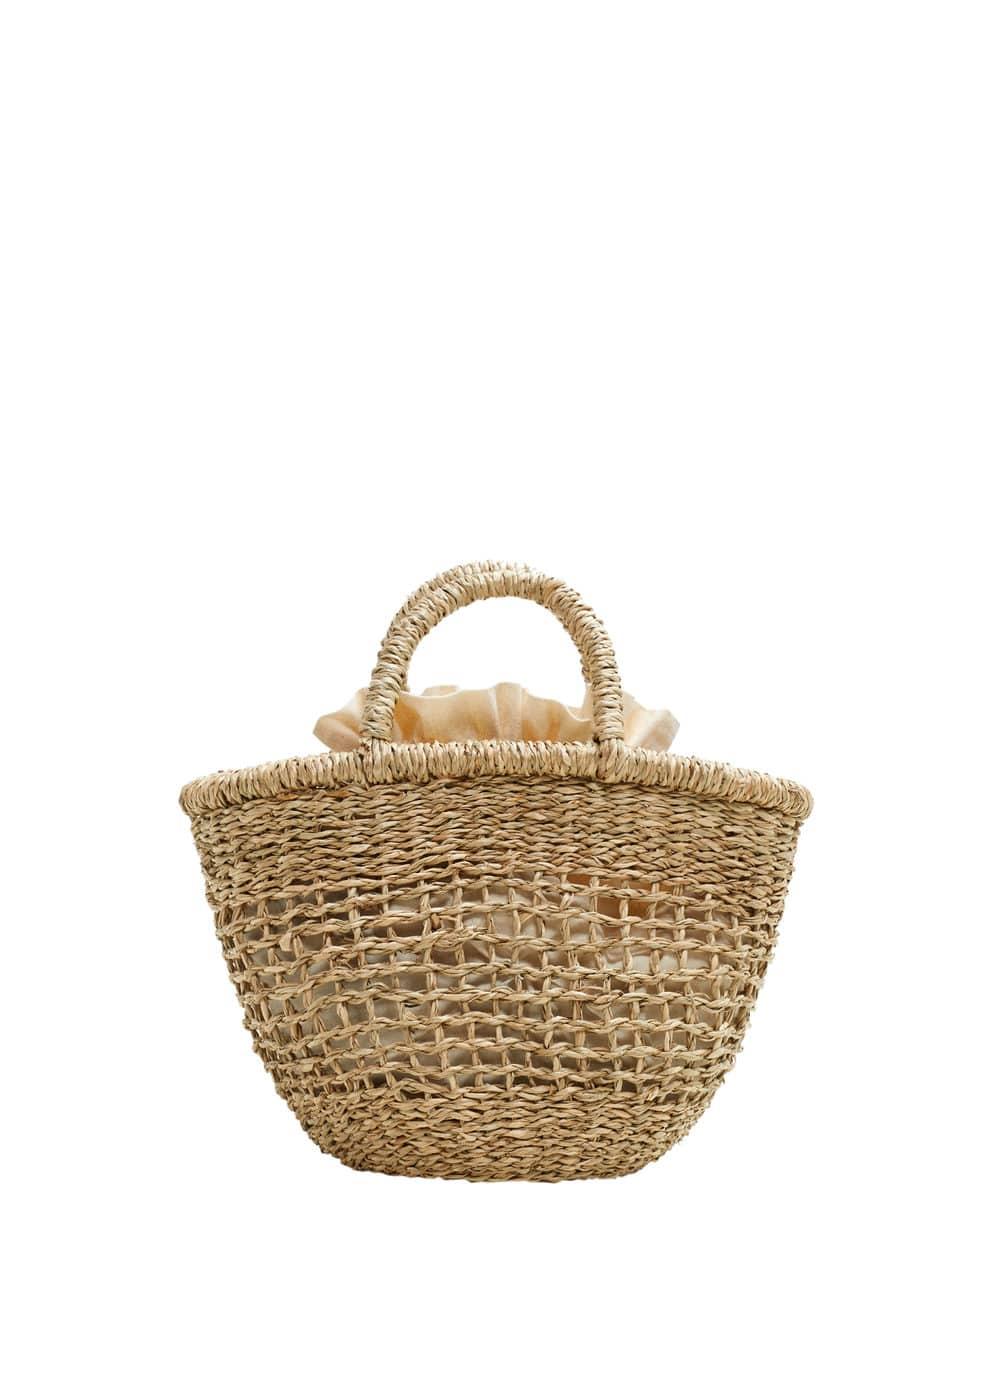 m-nila:mini capazo handmade